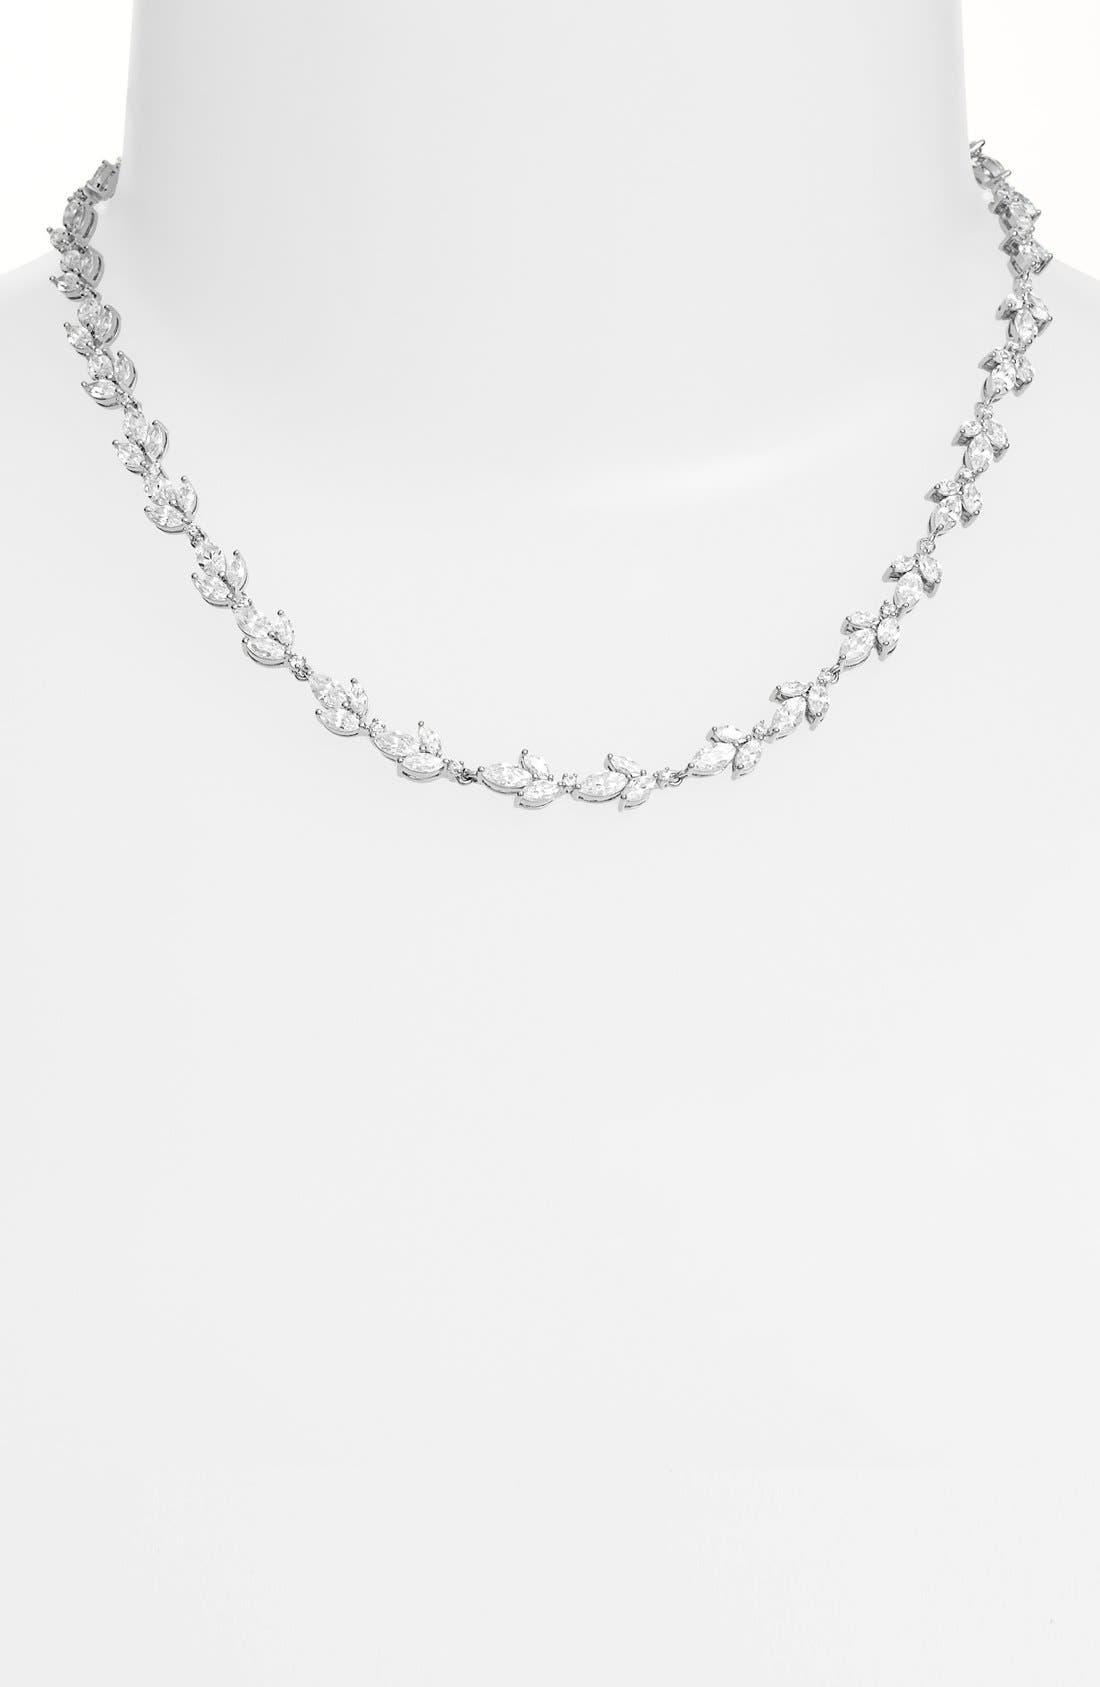 Alternate Image 1 Selected - Nadri 'Bloom' Cubic Zirconia Collar Necklace